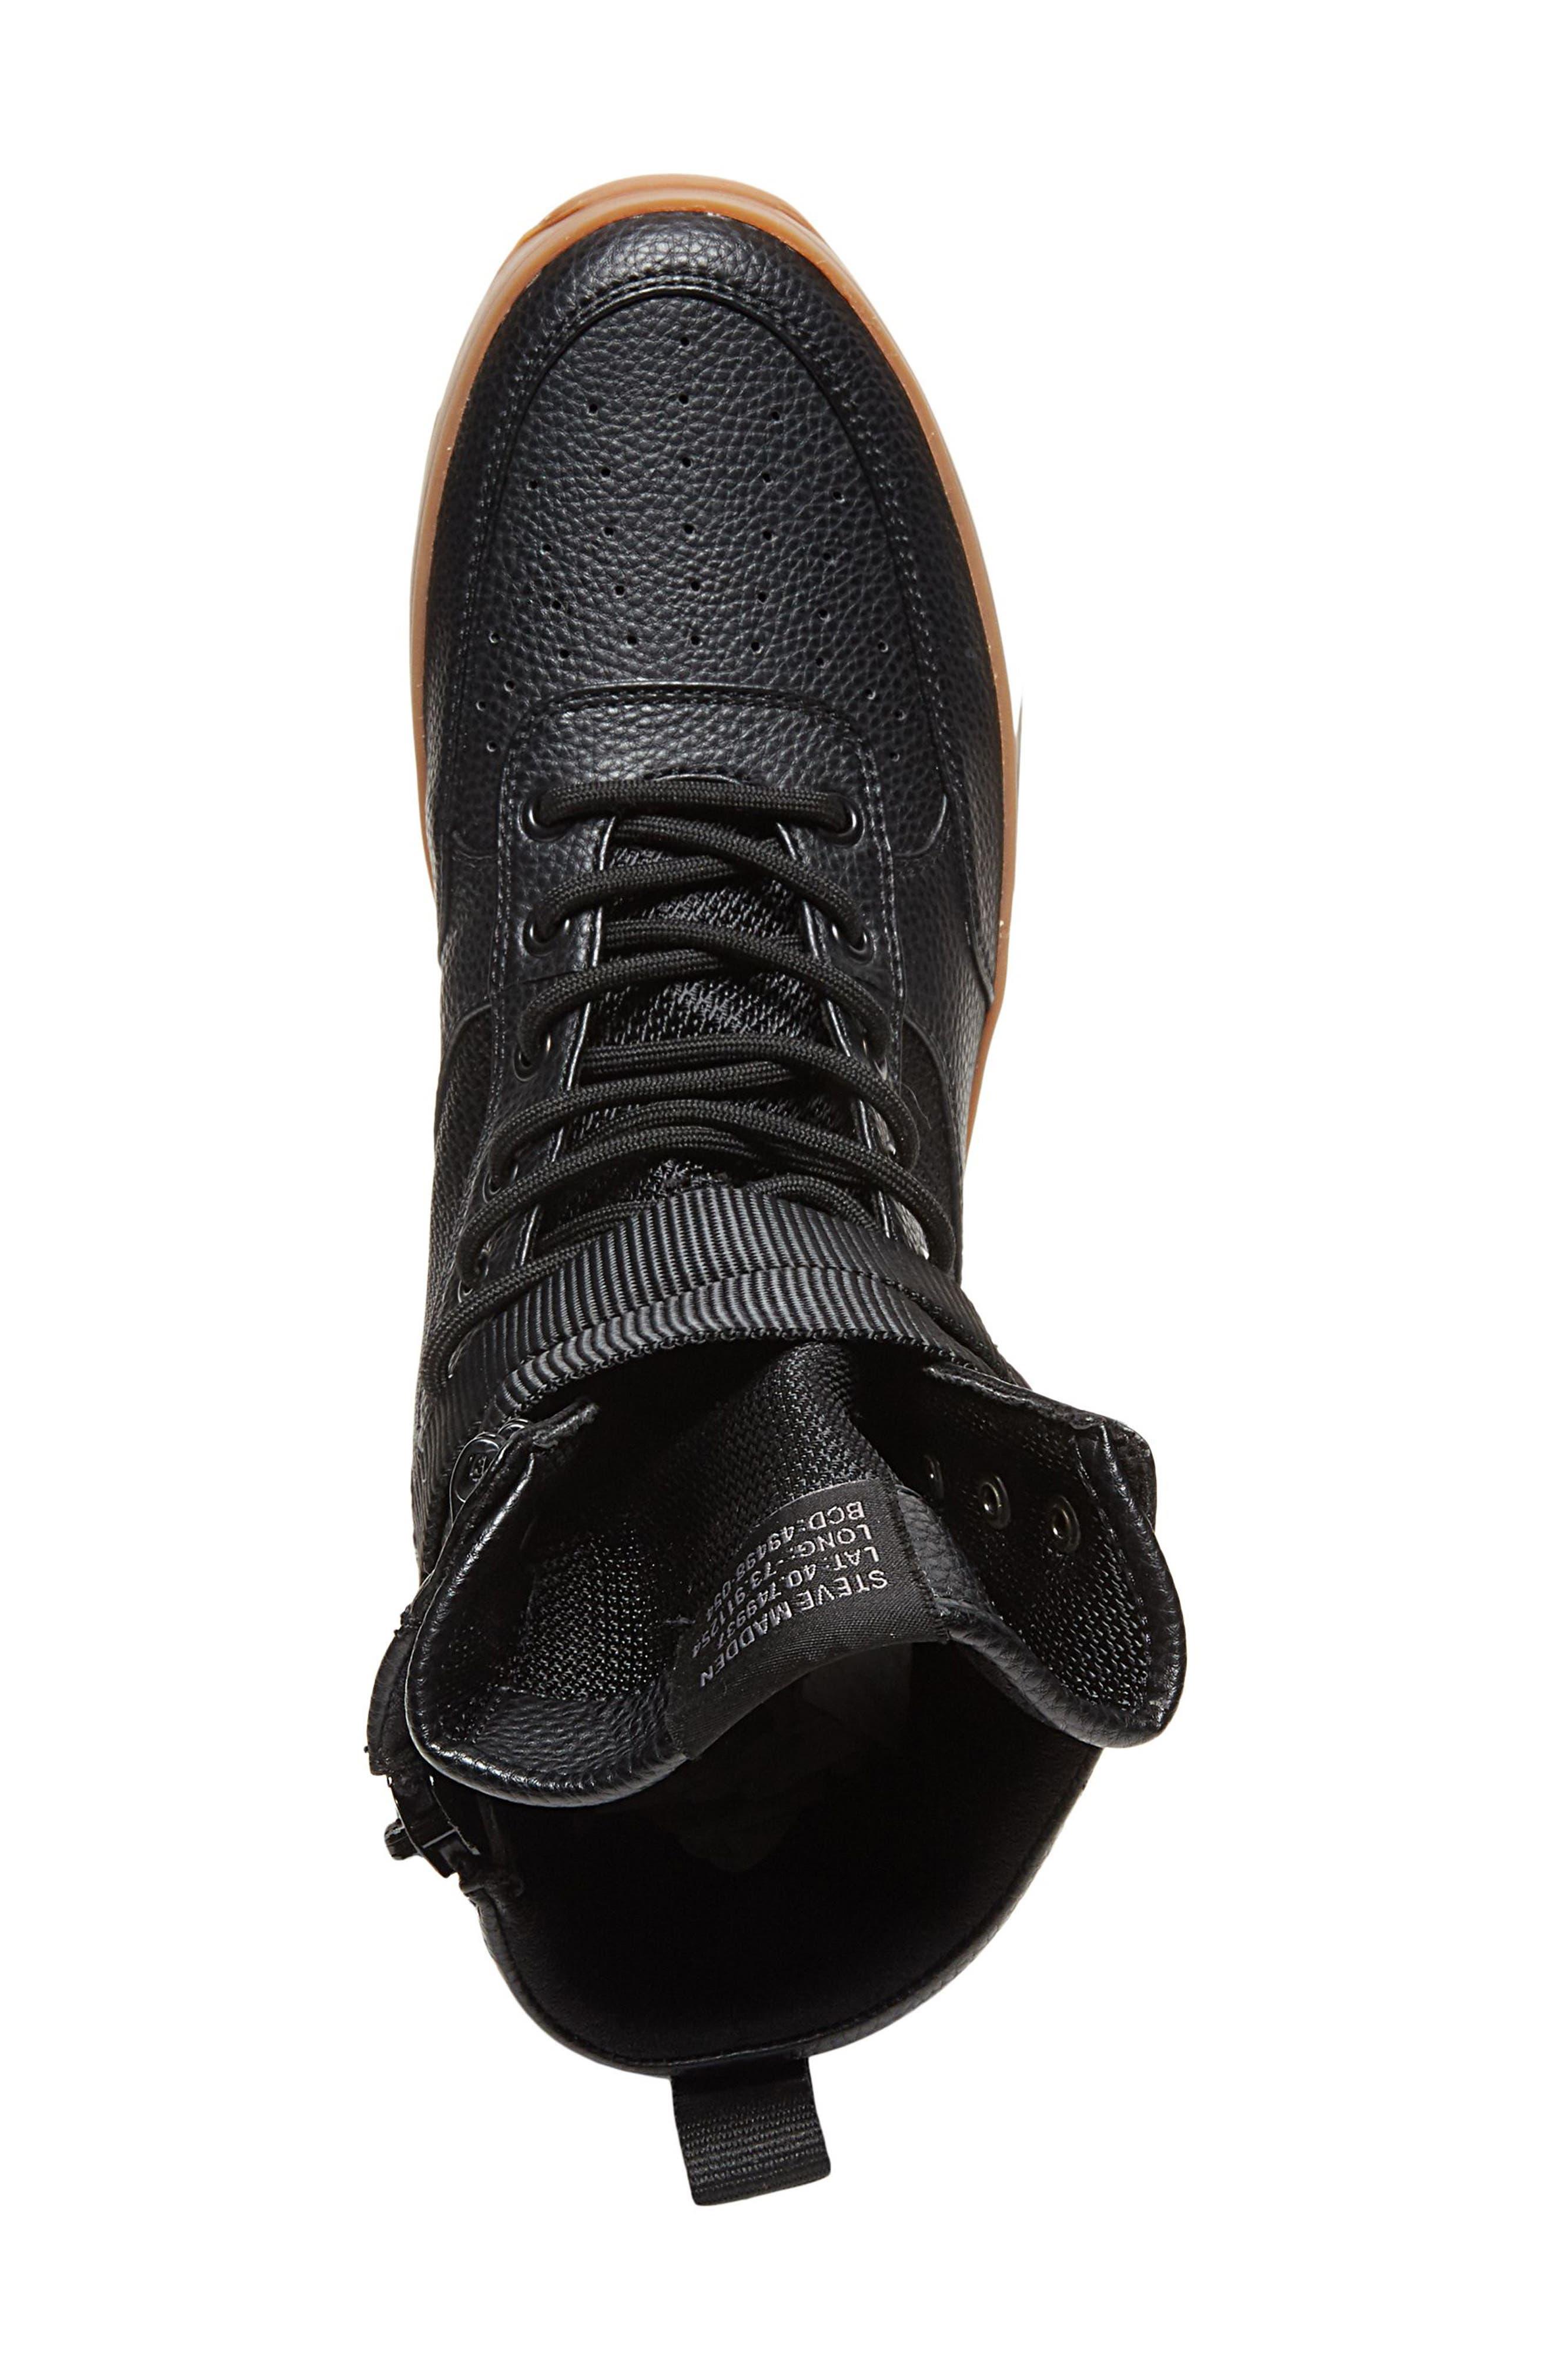 Zeroday Sneaker,                             Alternate thumbnail 4, color,                             Black